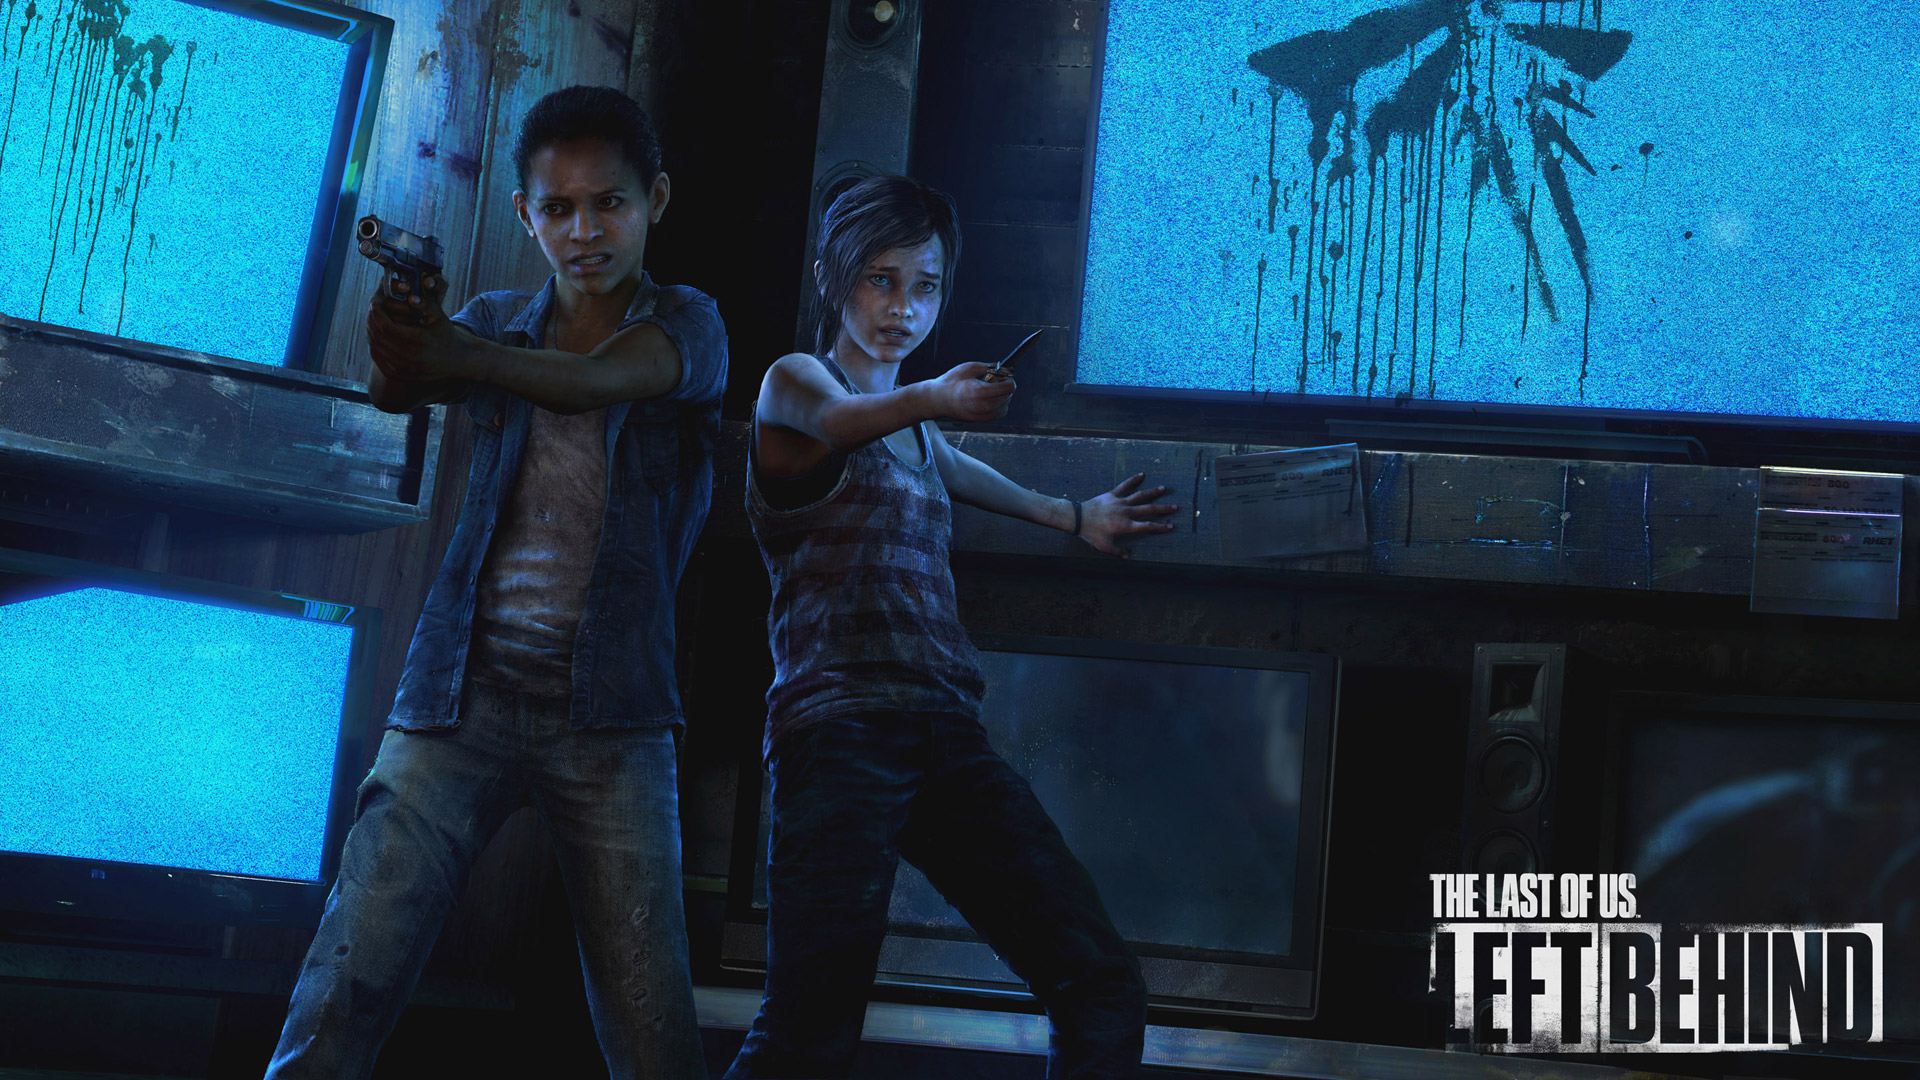 The Last of Us wallpaper 17